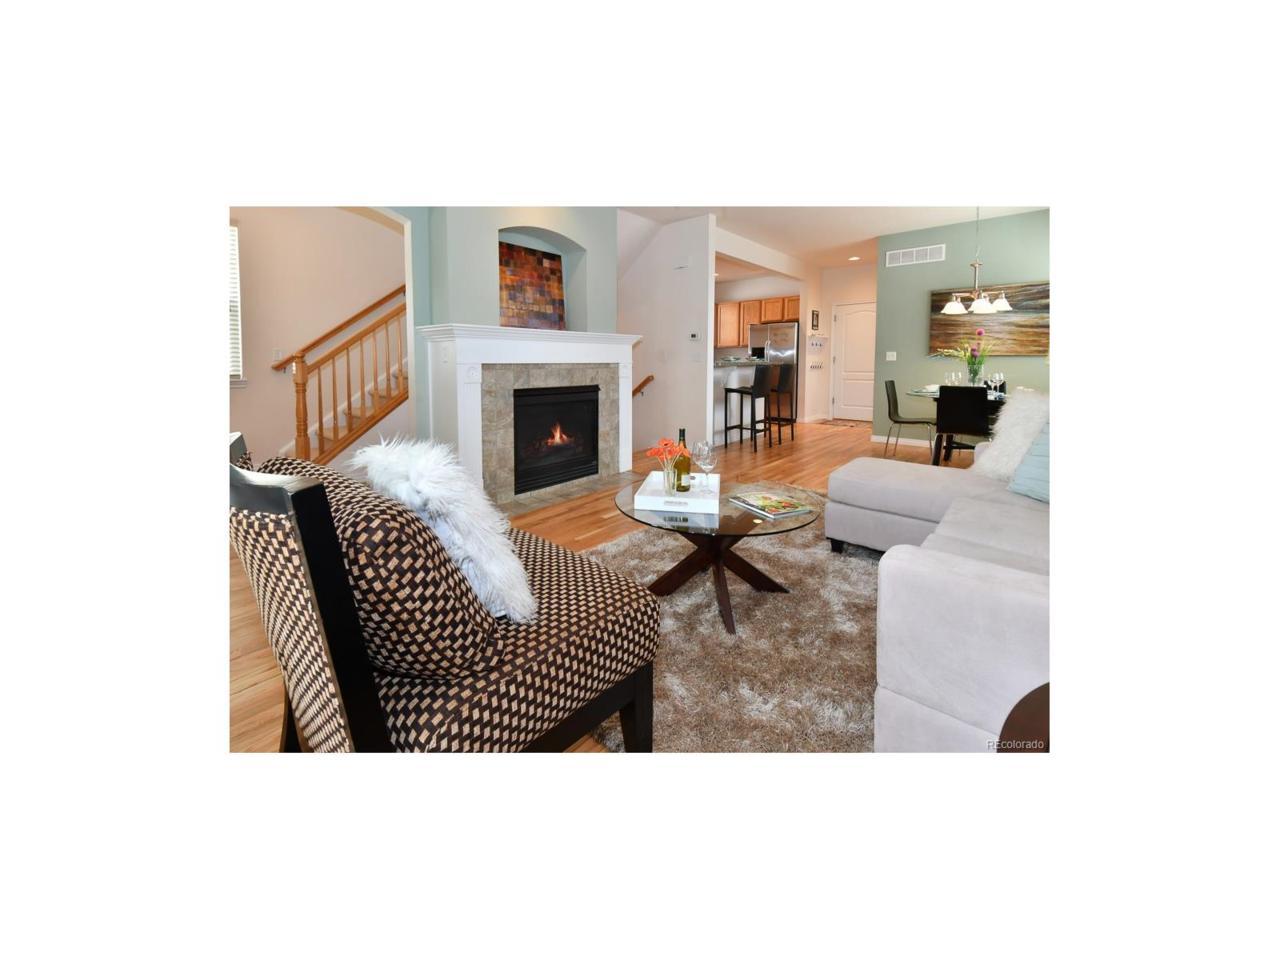 1524 Harvest Drive, Lafayette, CO 80026 (MLS #3388013) :: 8z Real Estate